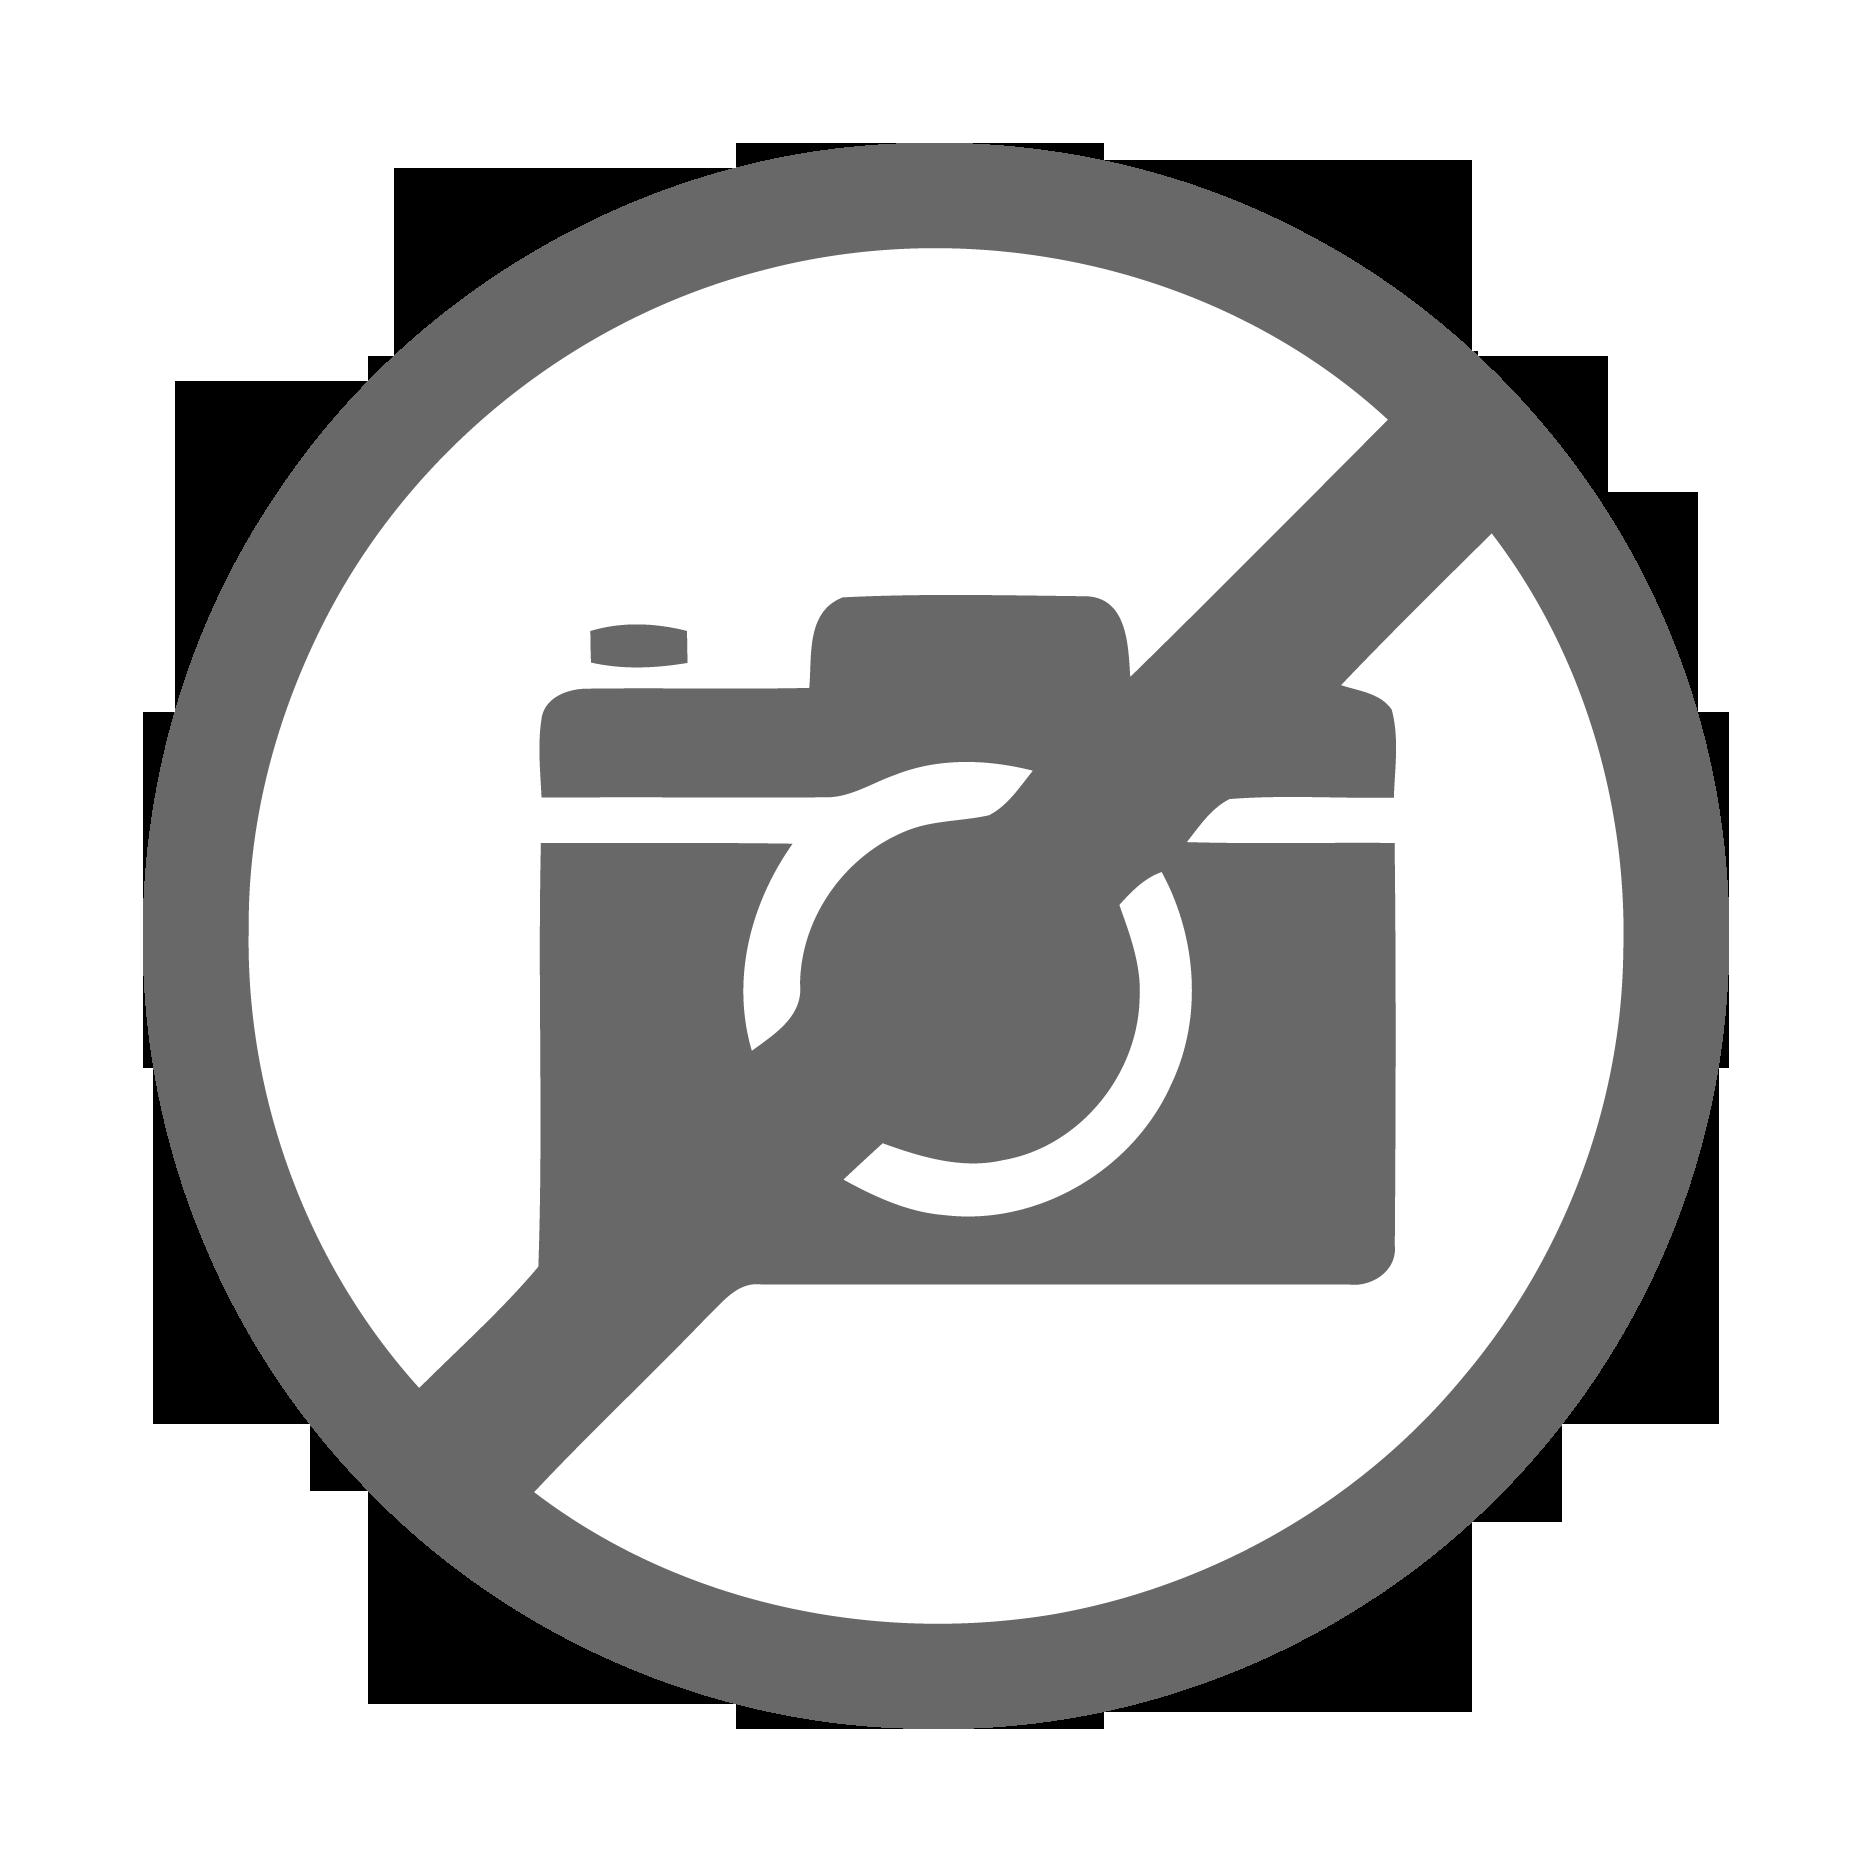 Corso Italia - актуални, стилни и неустоими модели дамски дрехи, обувки и аксесоари